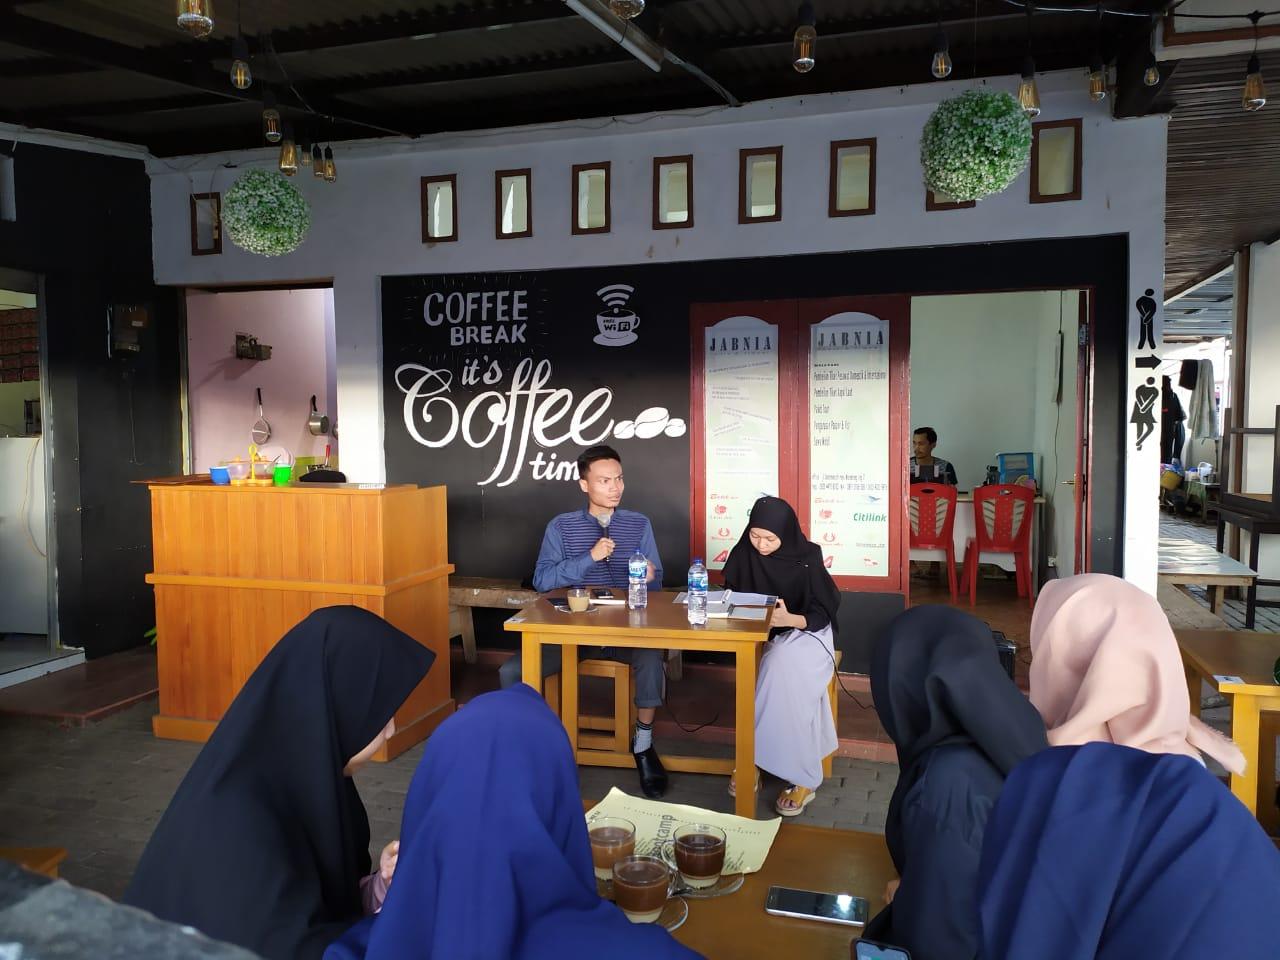 HMPS PS IAIN Manado undang Nugraha Hasan Jadi Pembicara Diskusi